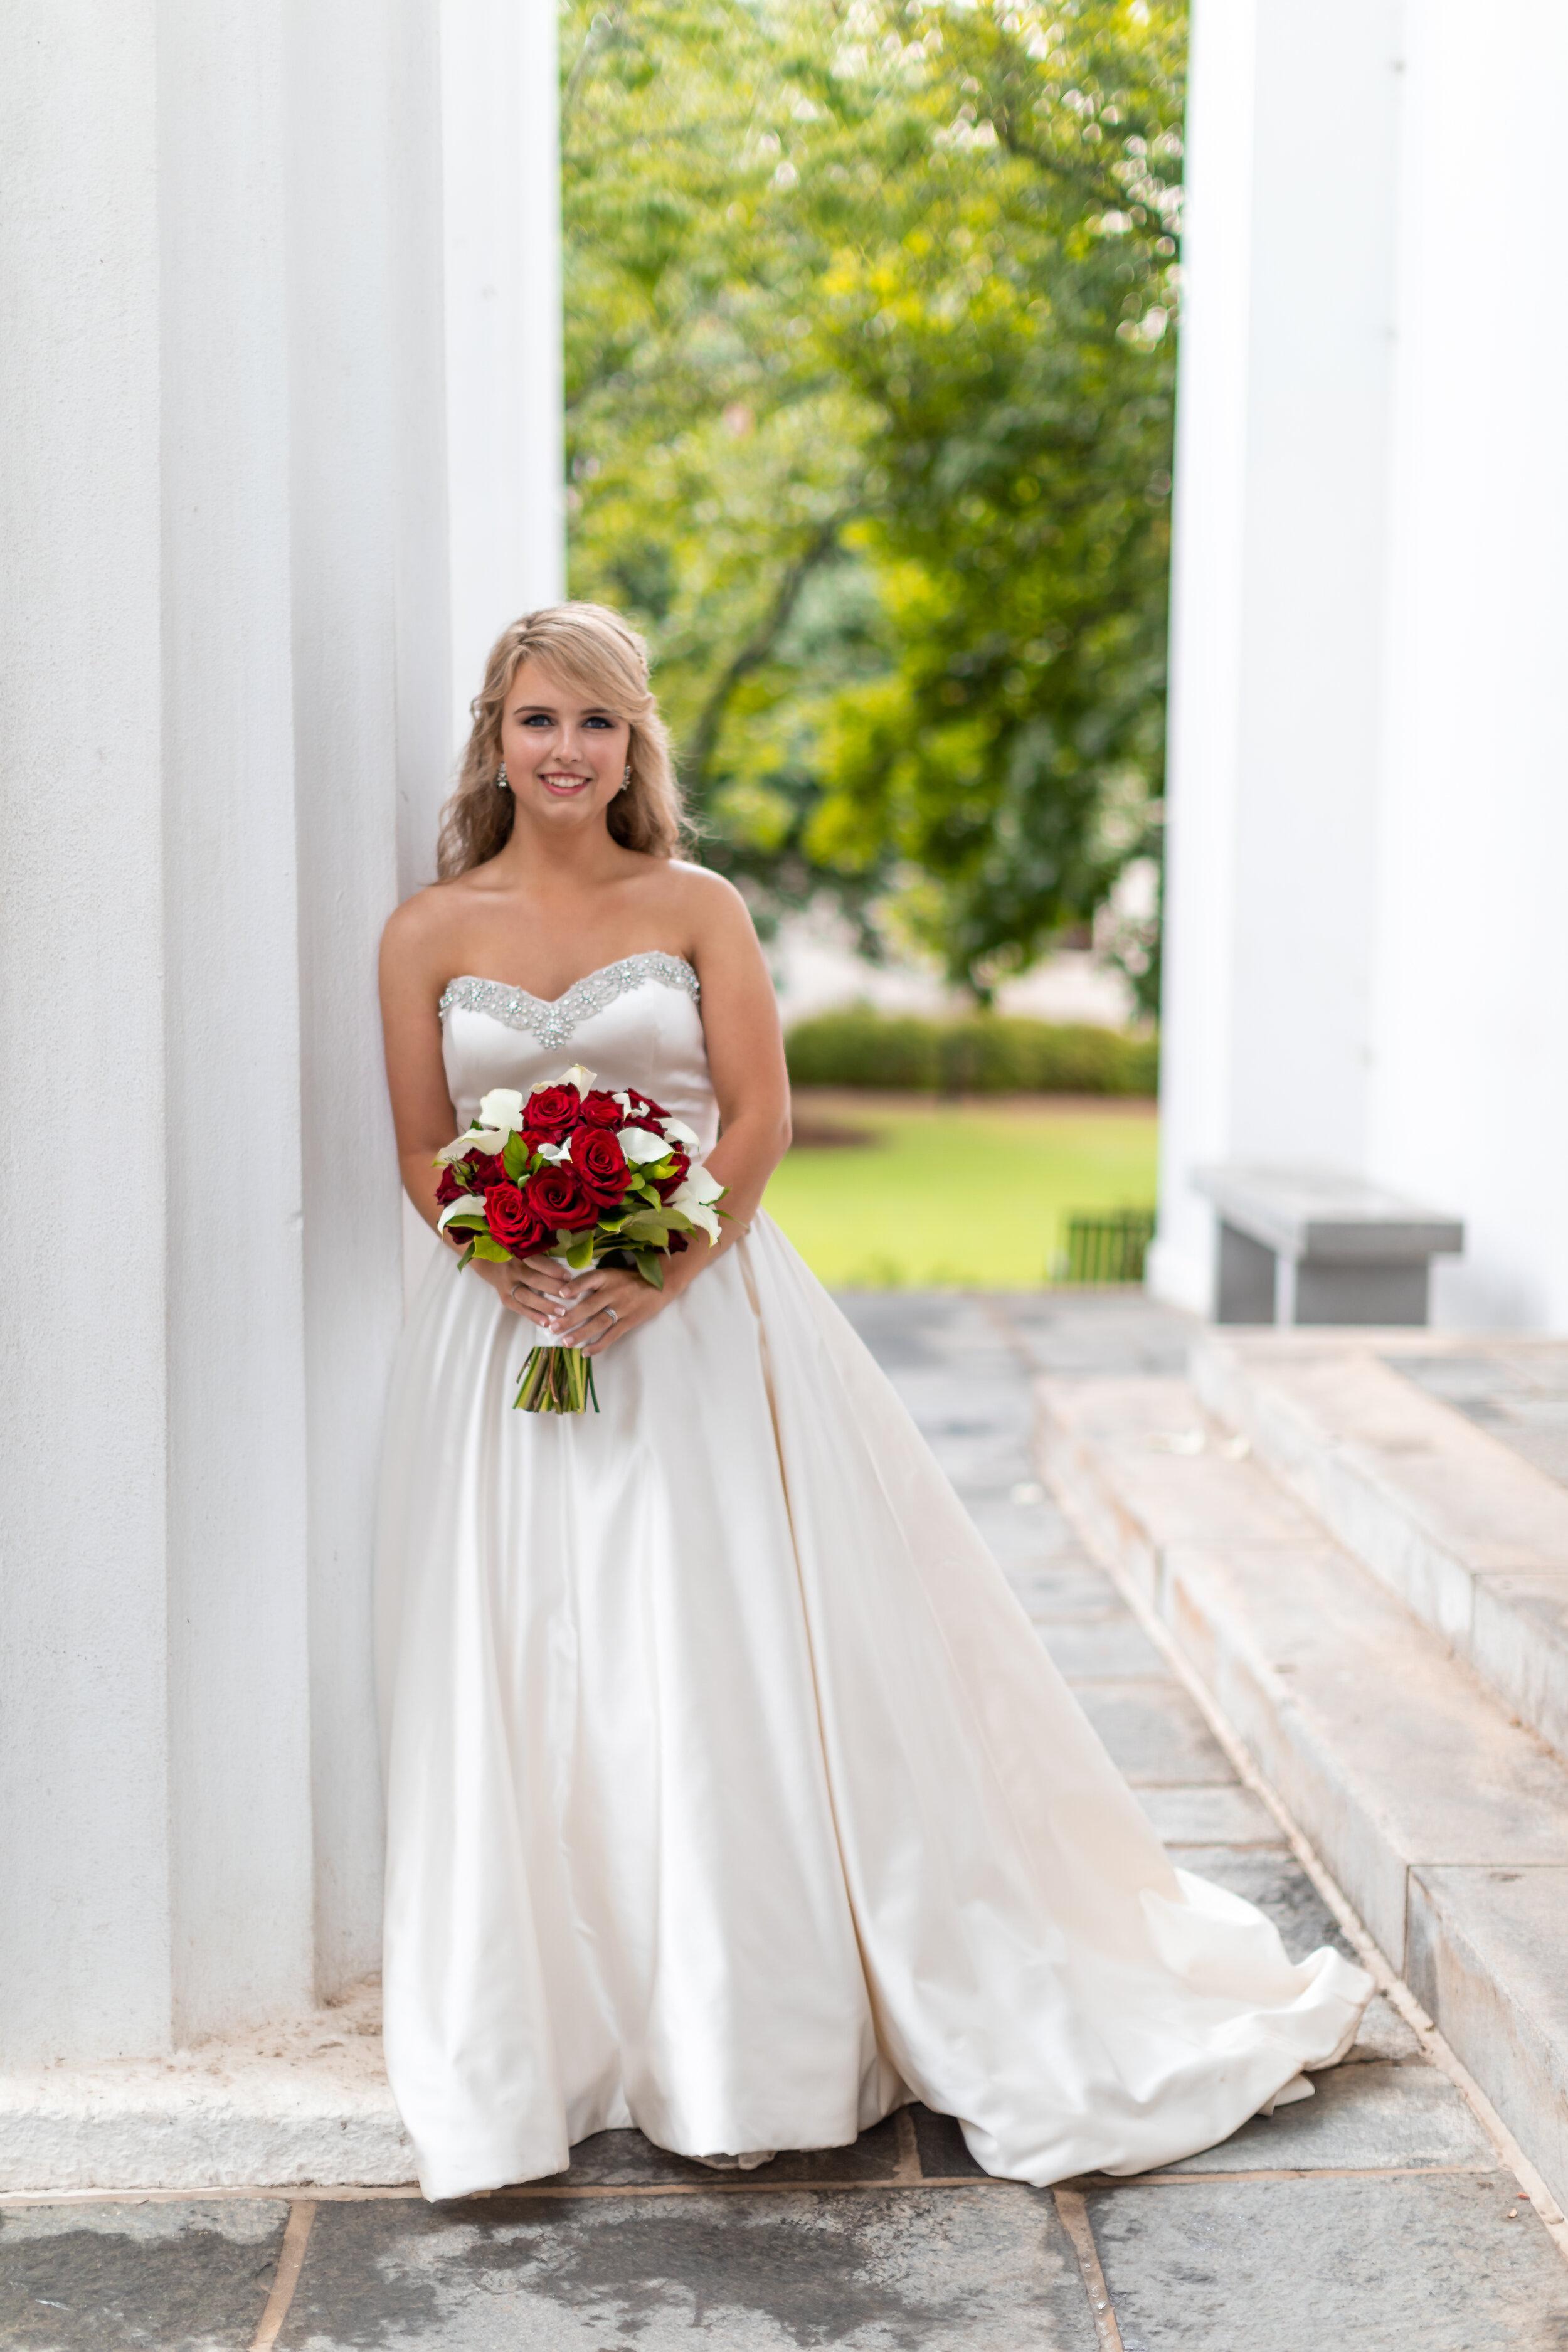 Wedding Photos - Final Edits - Post Ceremony Portraits-49.jpg